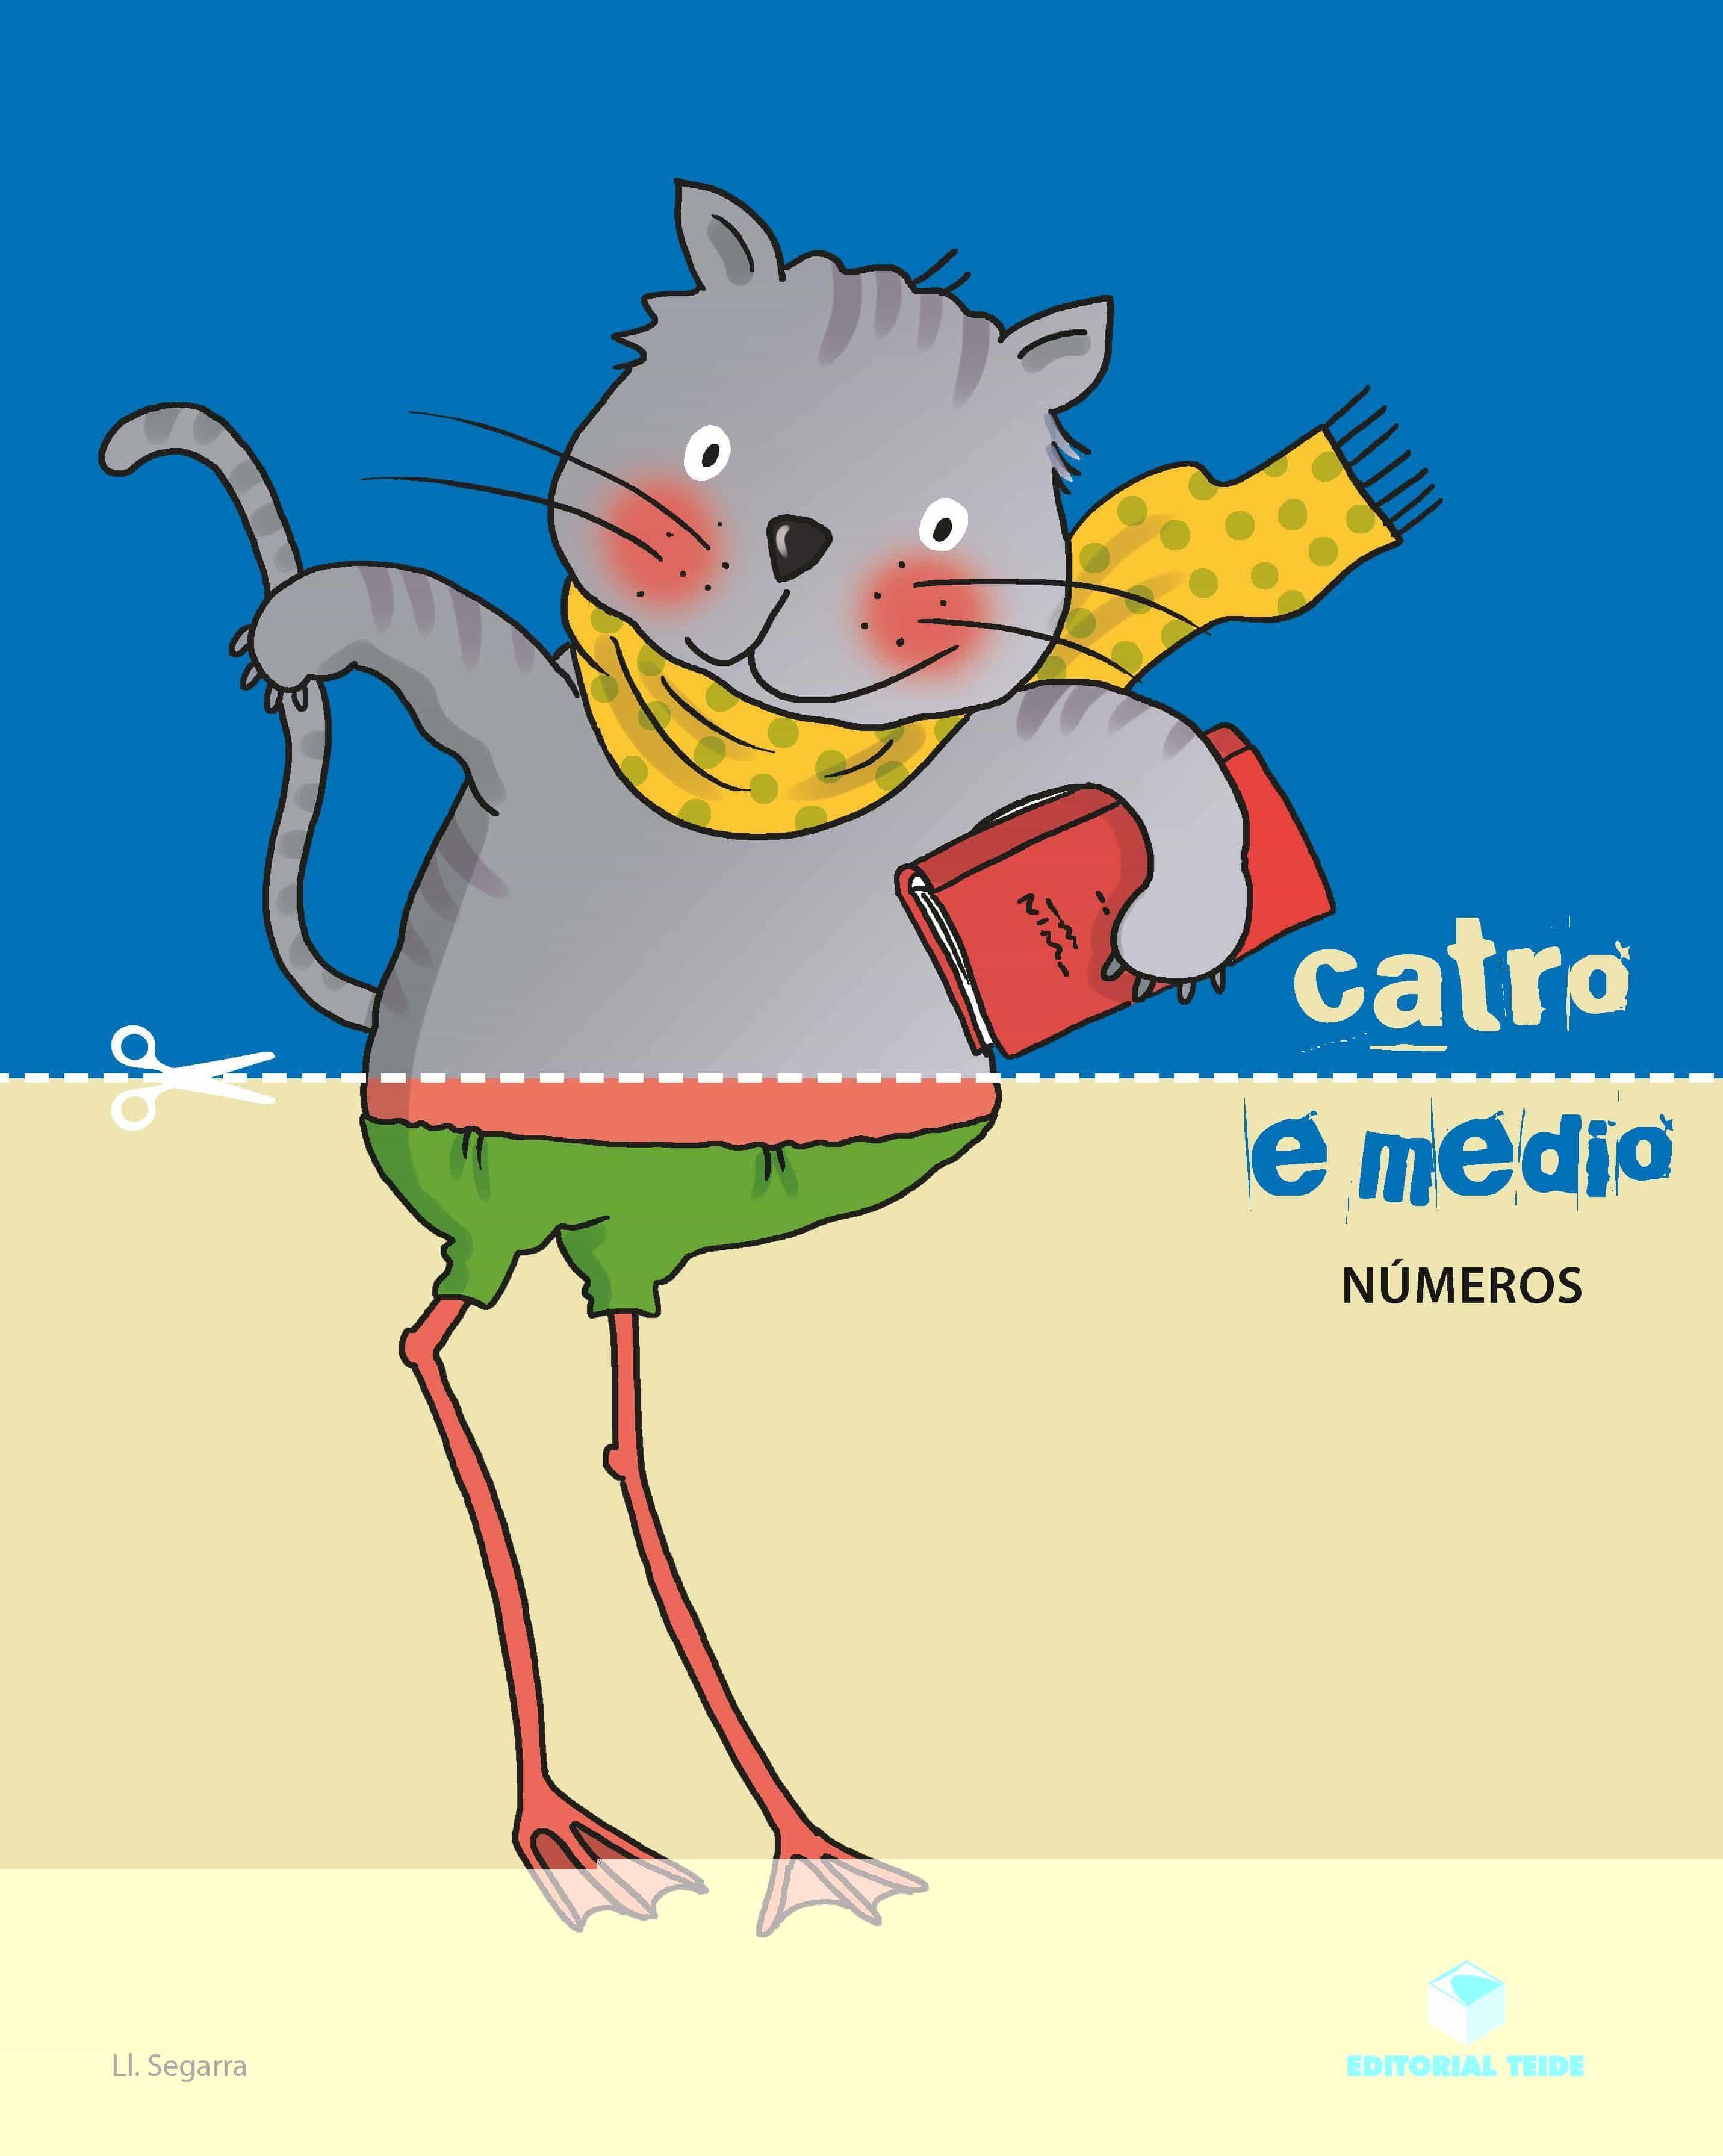 Catro E Medio Numeros Caderno Matematica 4 Anos Galicia Ed 2017 - Vv.aa.